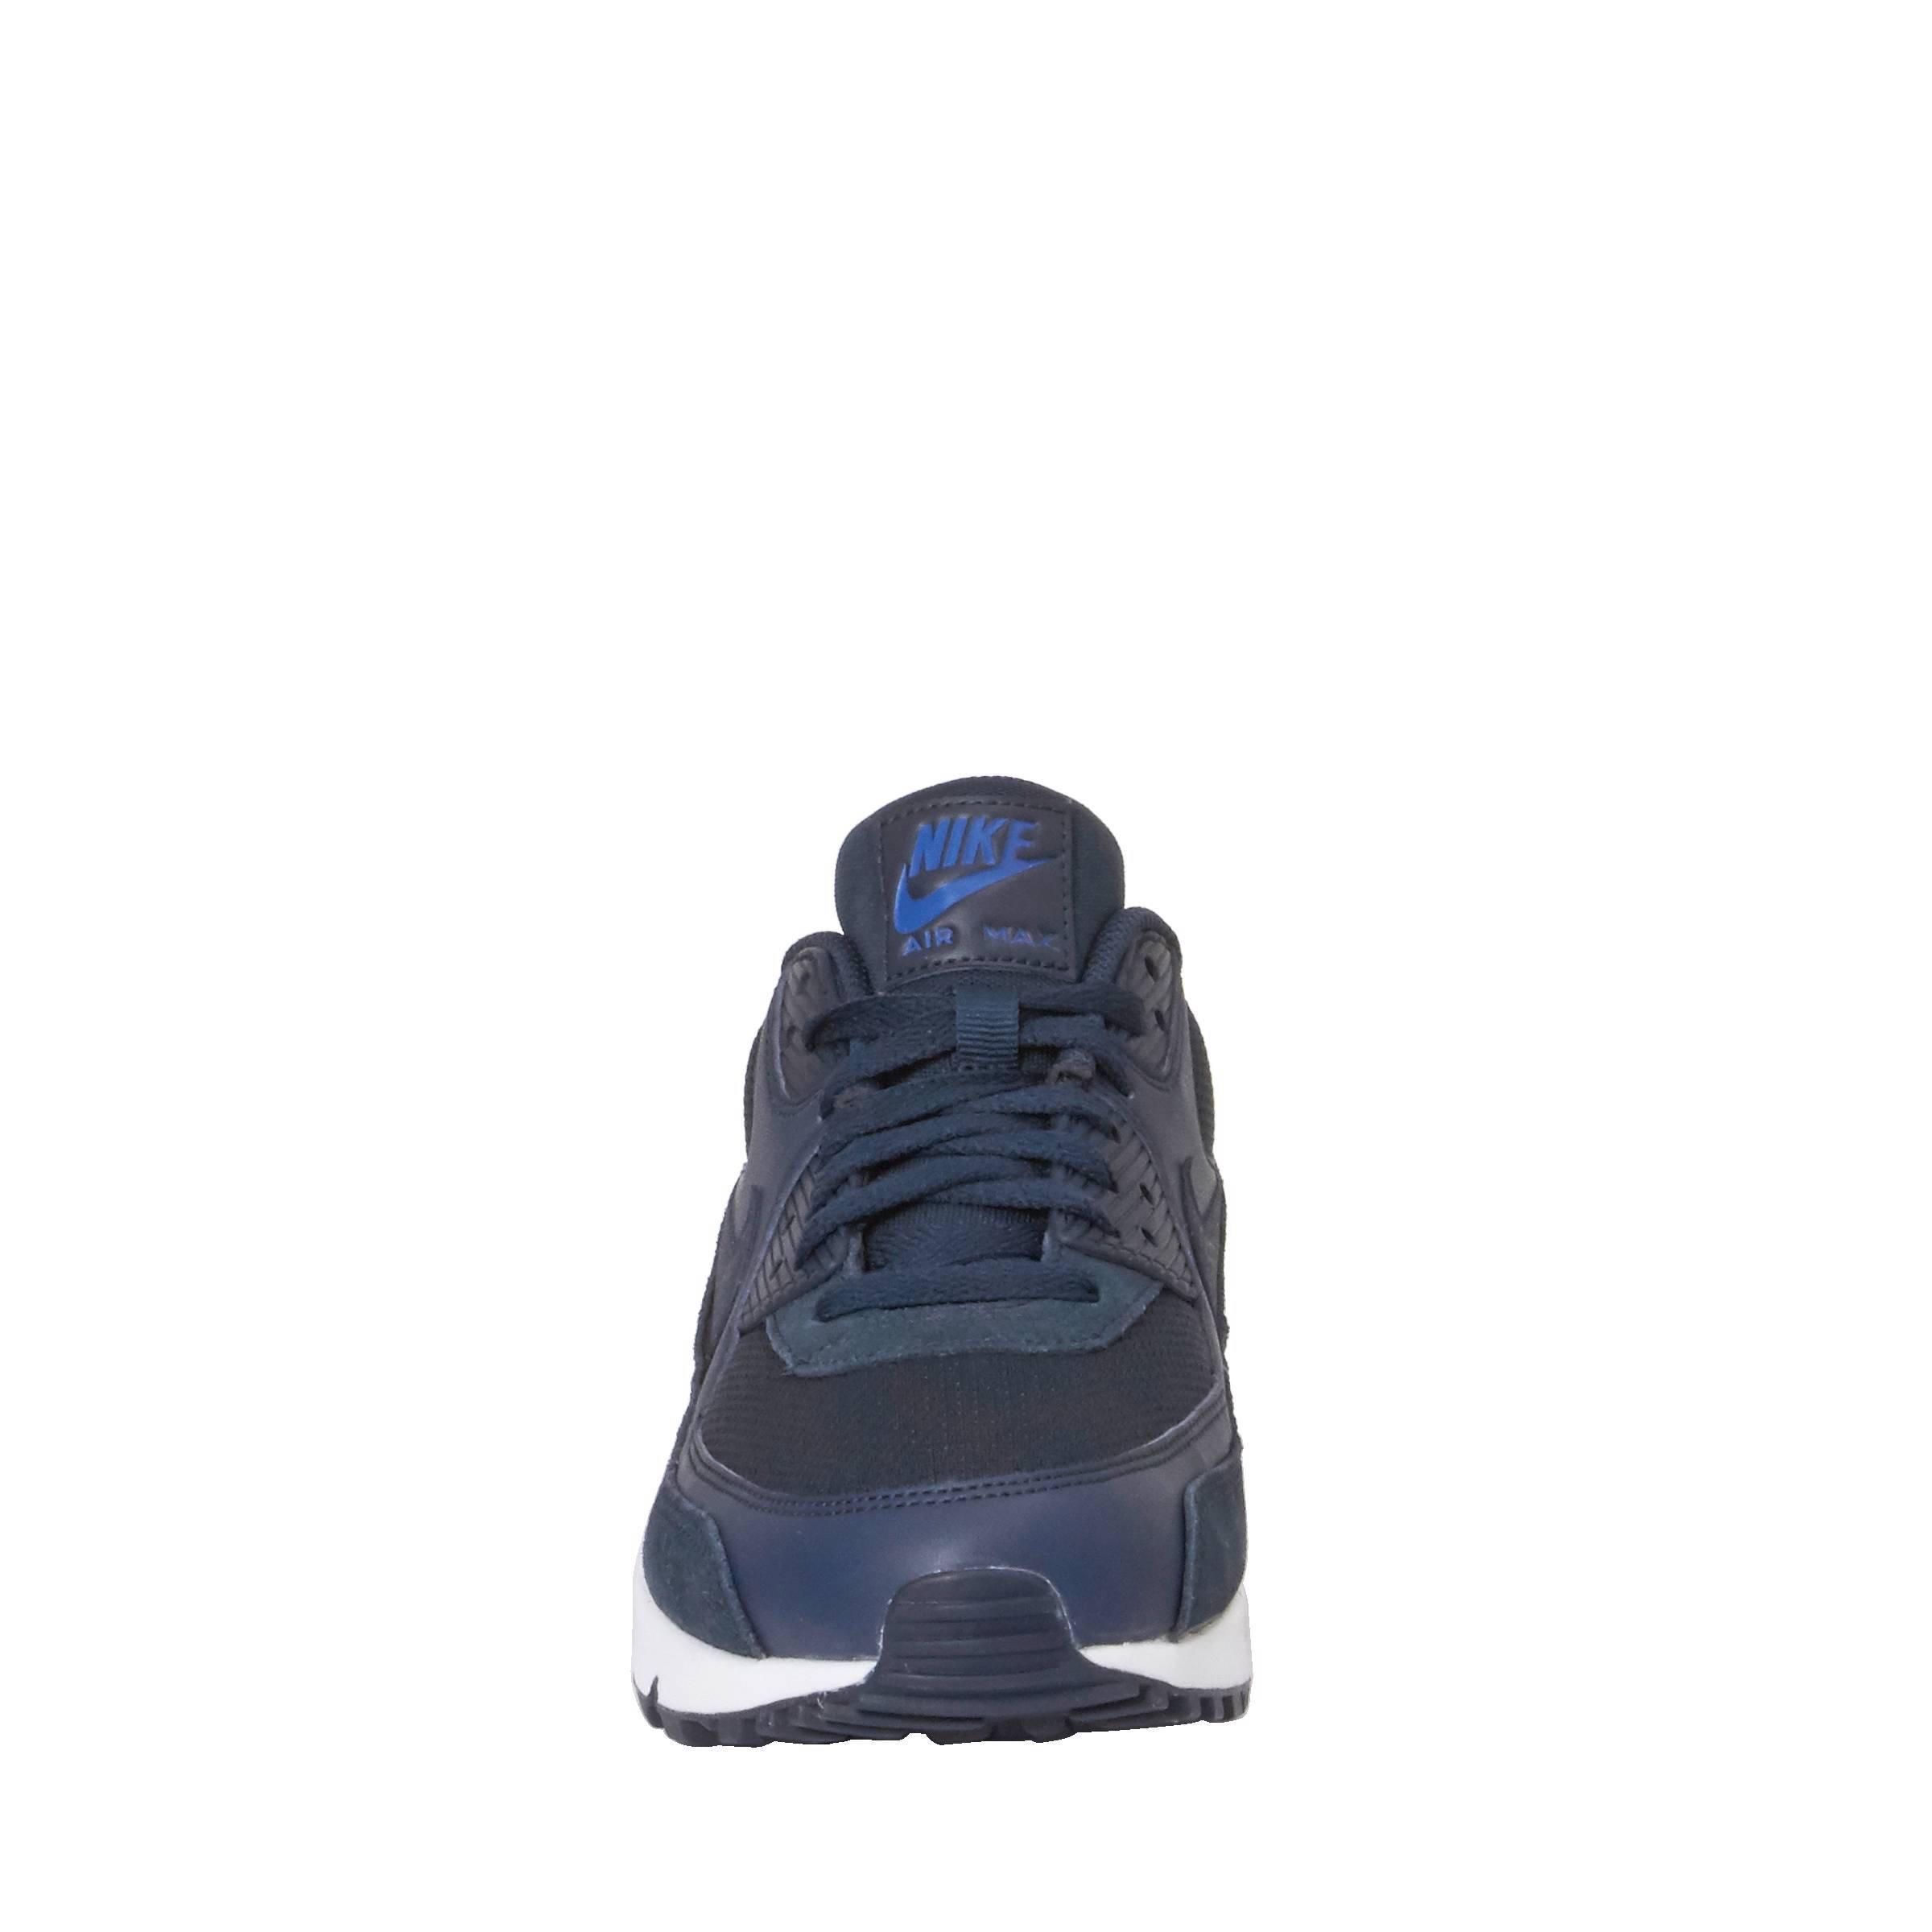 8da6972f6d3 nike-air-max-90-essential-sneakers-donkerblauw-0884776266804.jpg